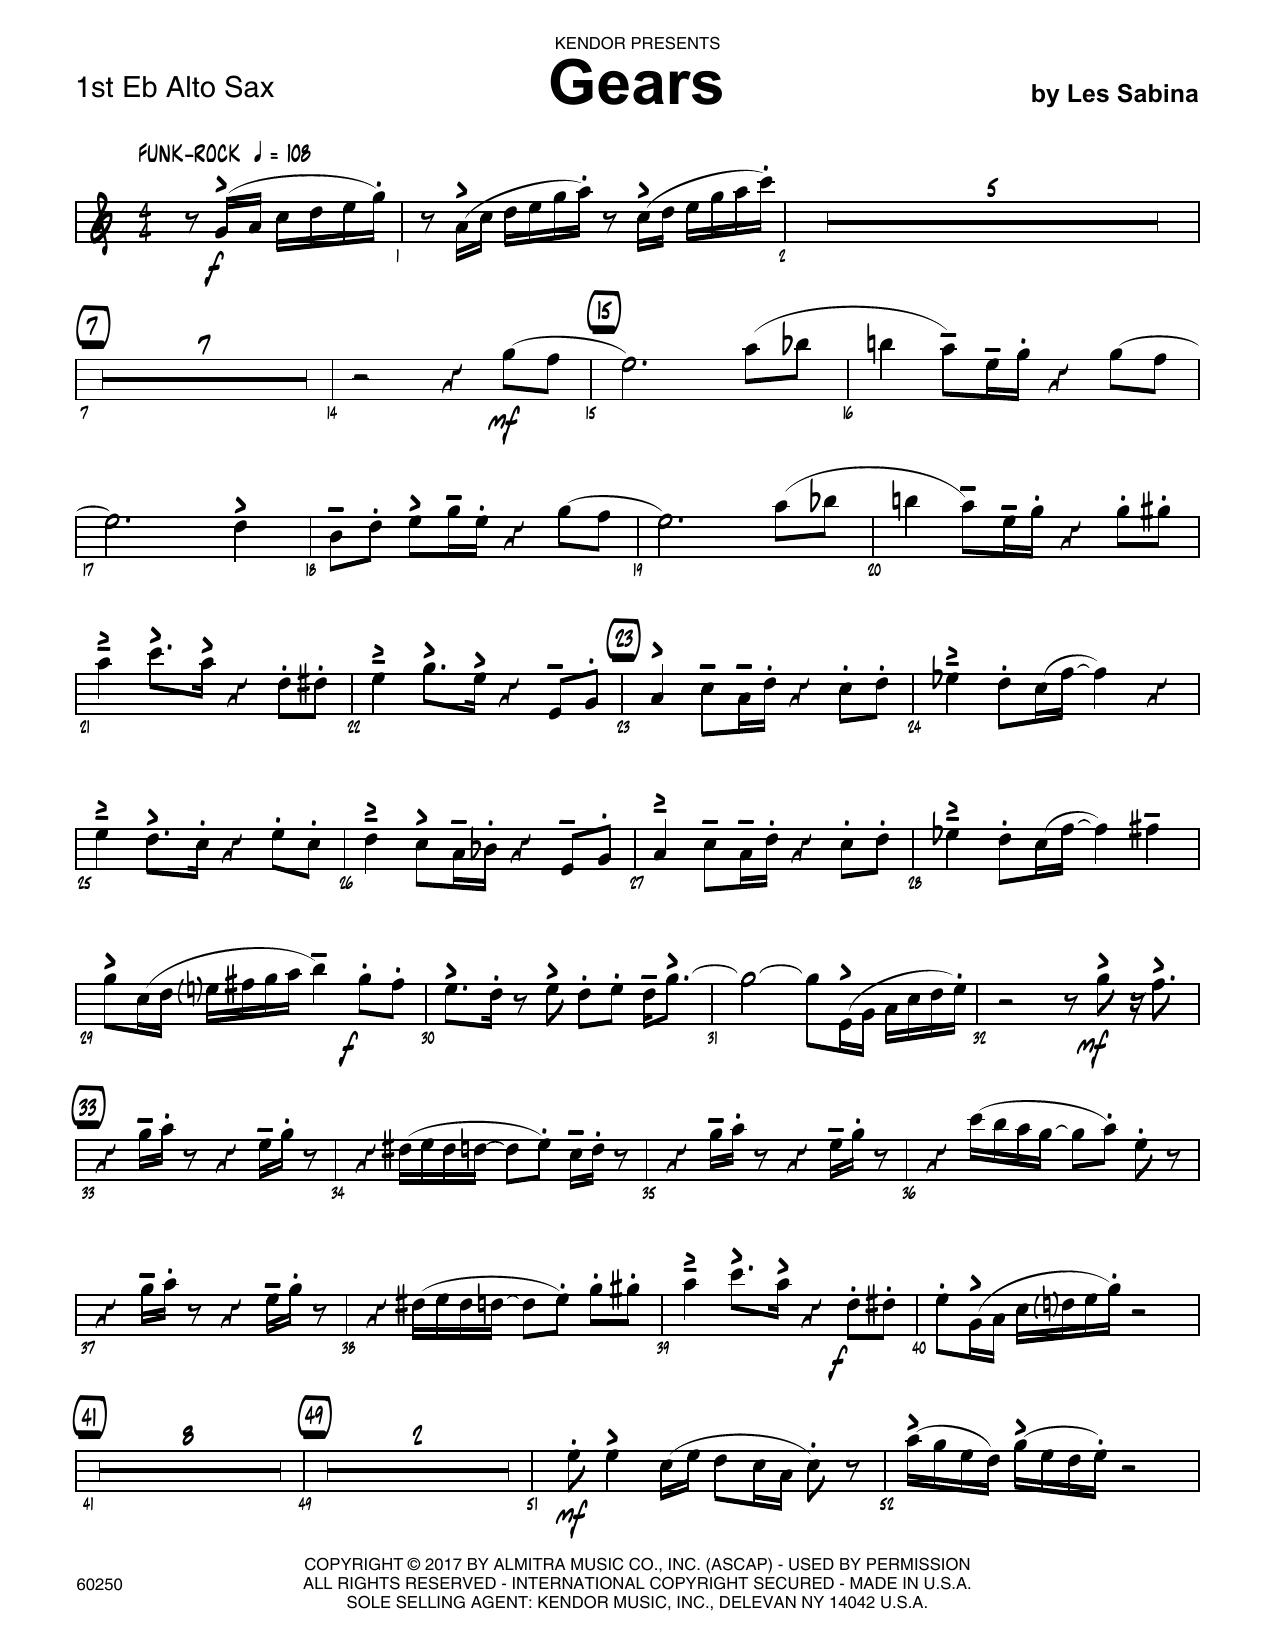 Les Sabina Gears - 1st Eb Alto Saxophone sheet music notes printable PDF score